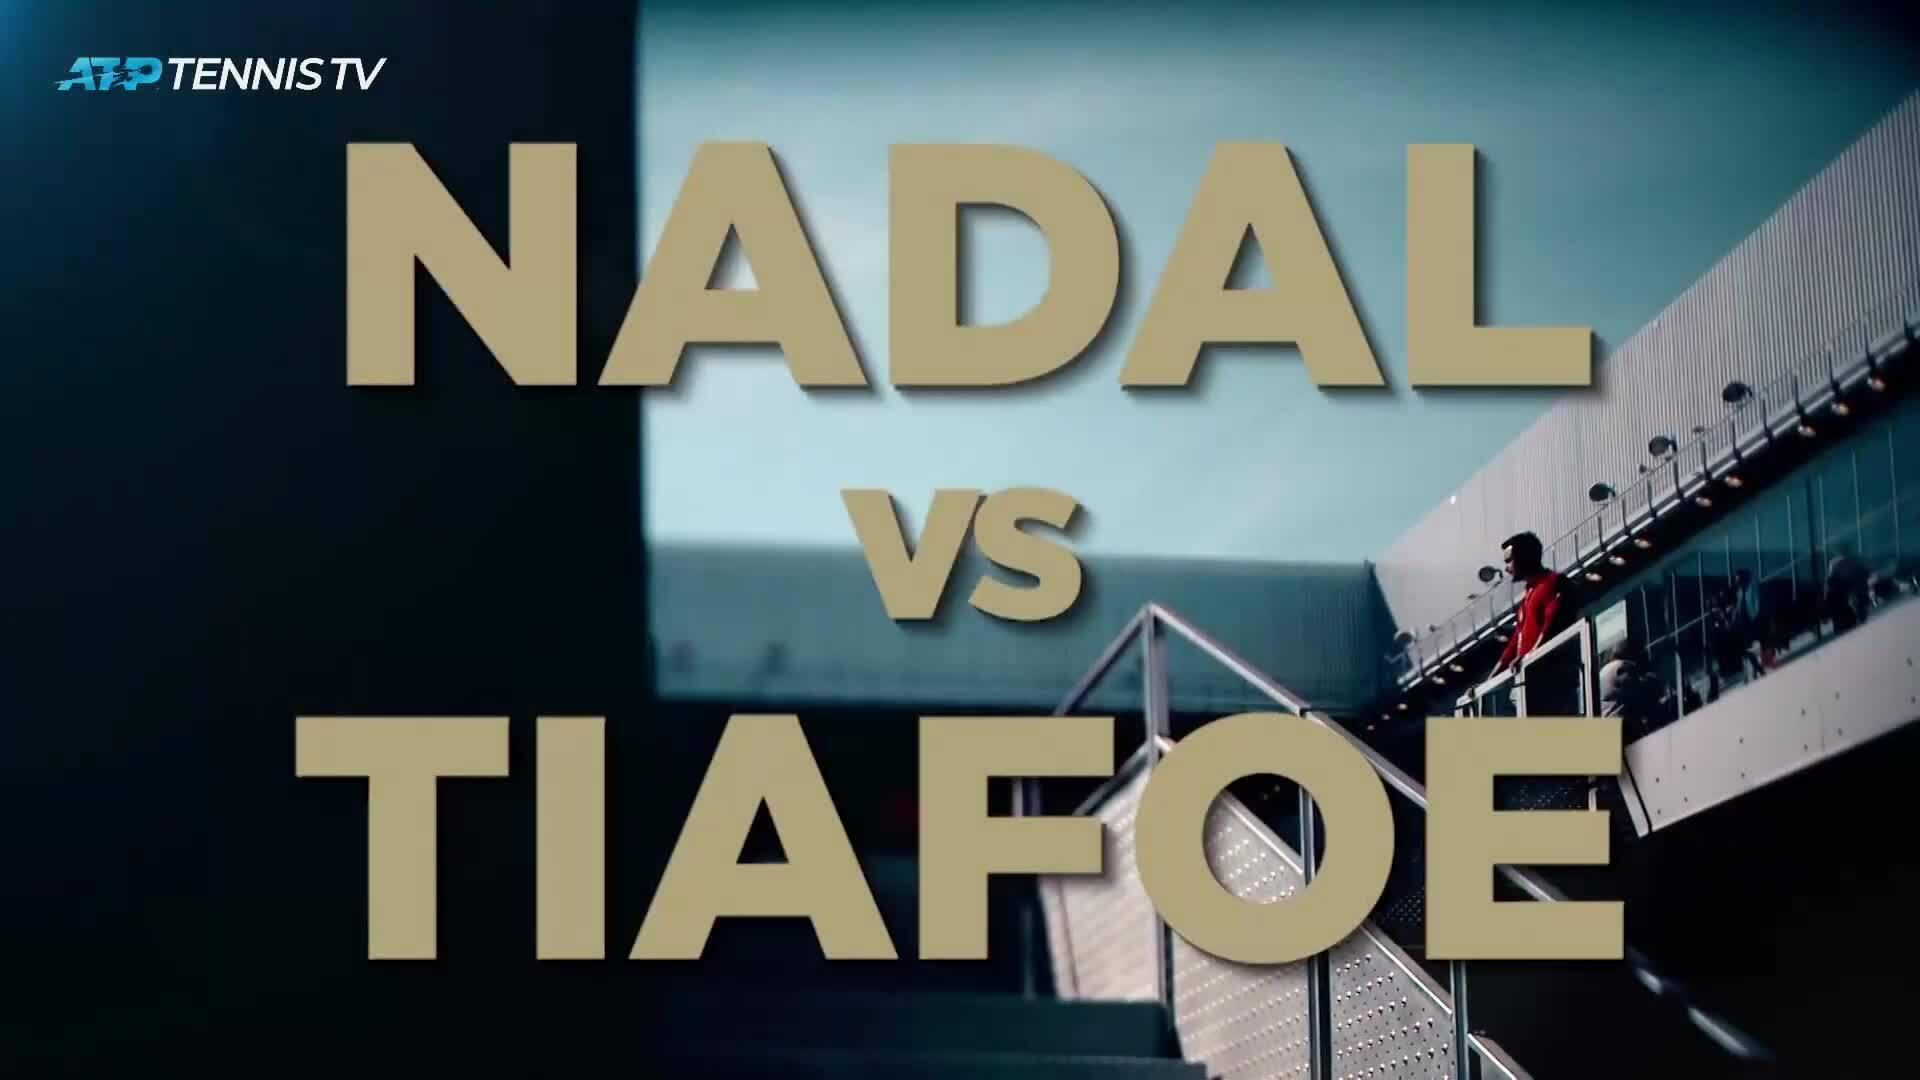 Frances Tiafoe 0-2 Rafael Nadal